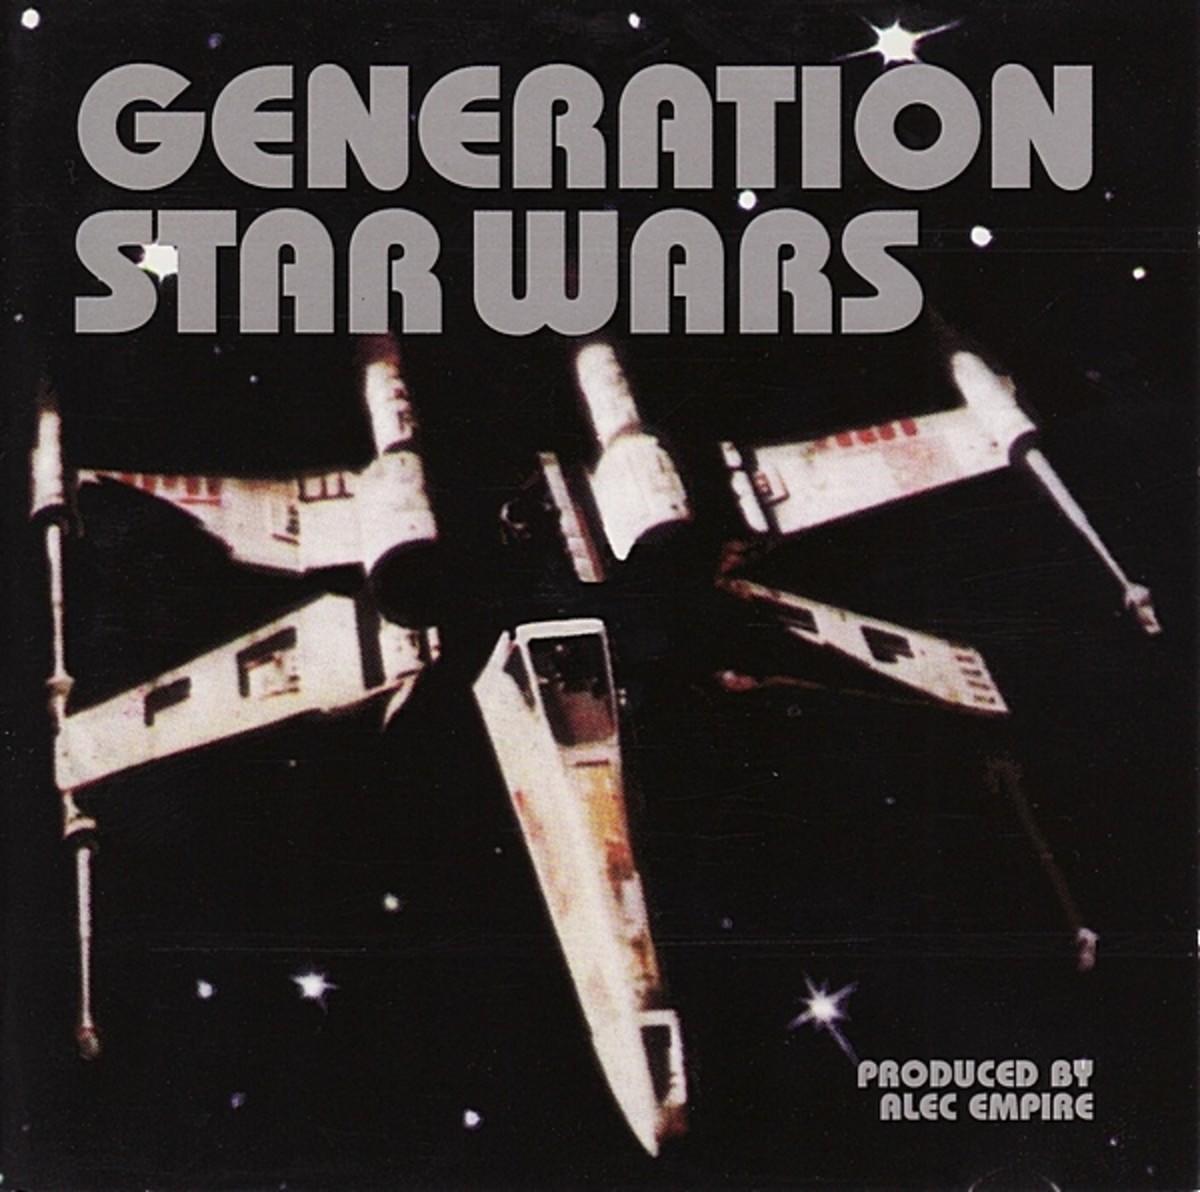 "Alec Empire ""Generation Star Wars"" Mille Plateaux MP 11 212"" LP Vinyl Record Set (1994) German Pressing"